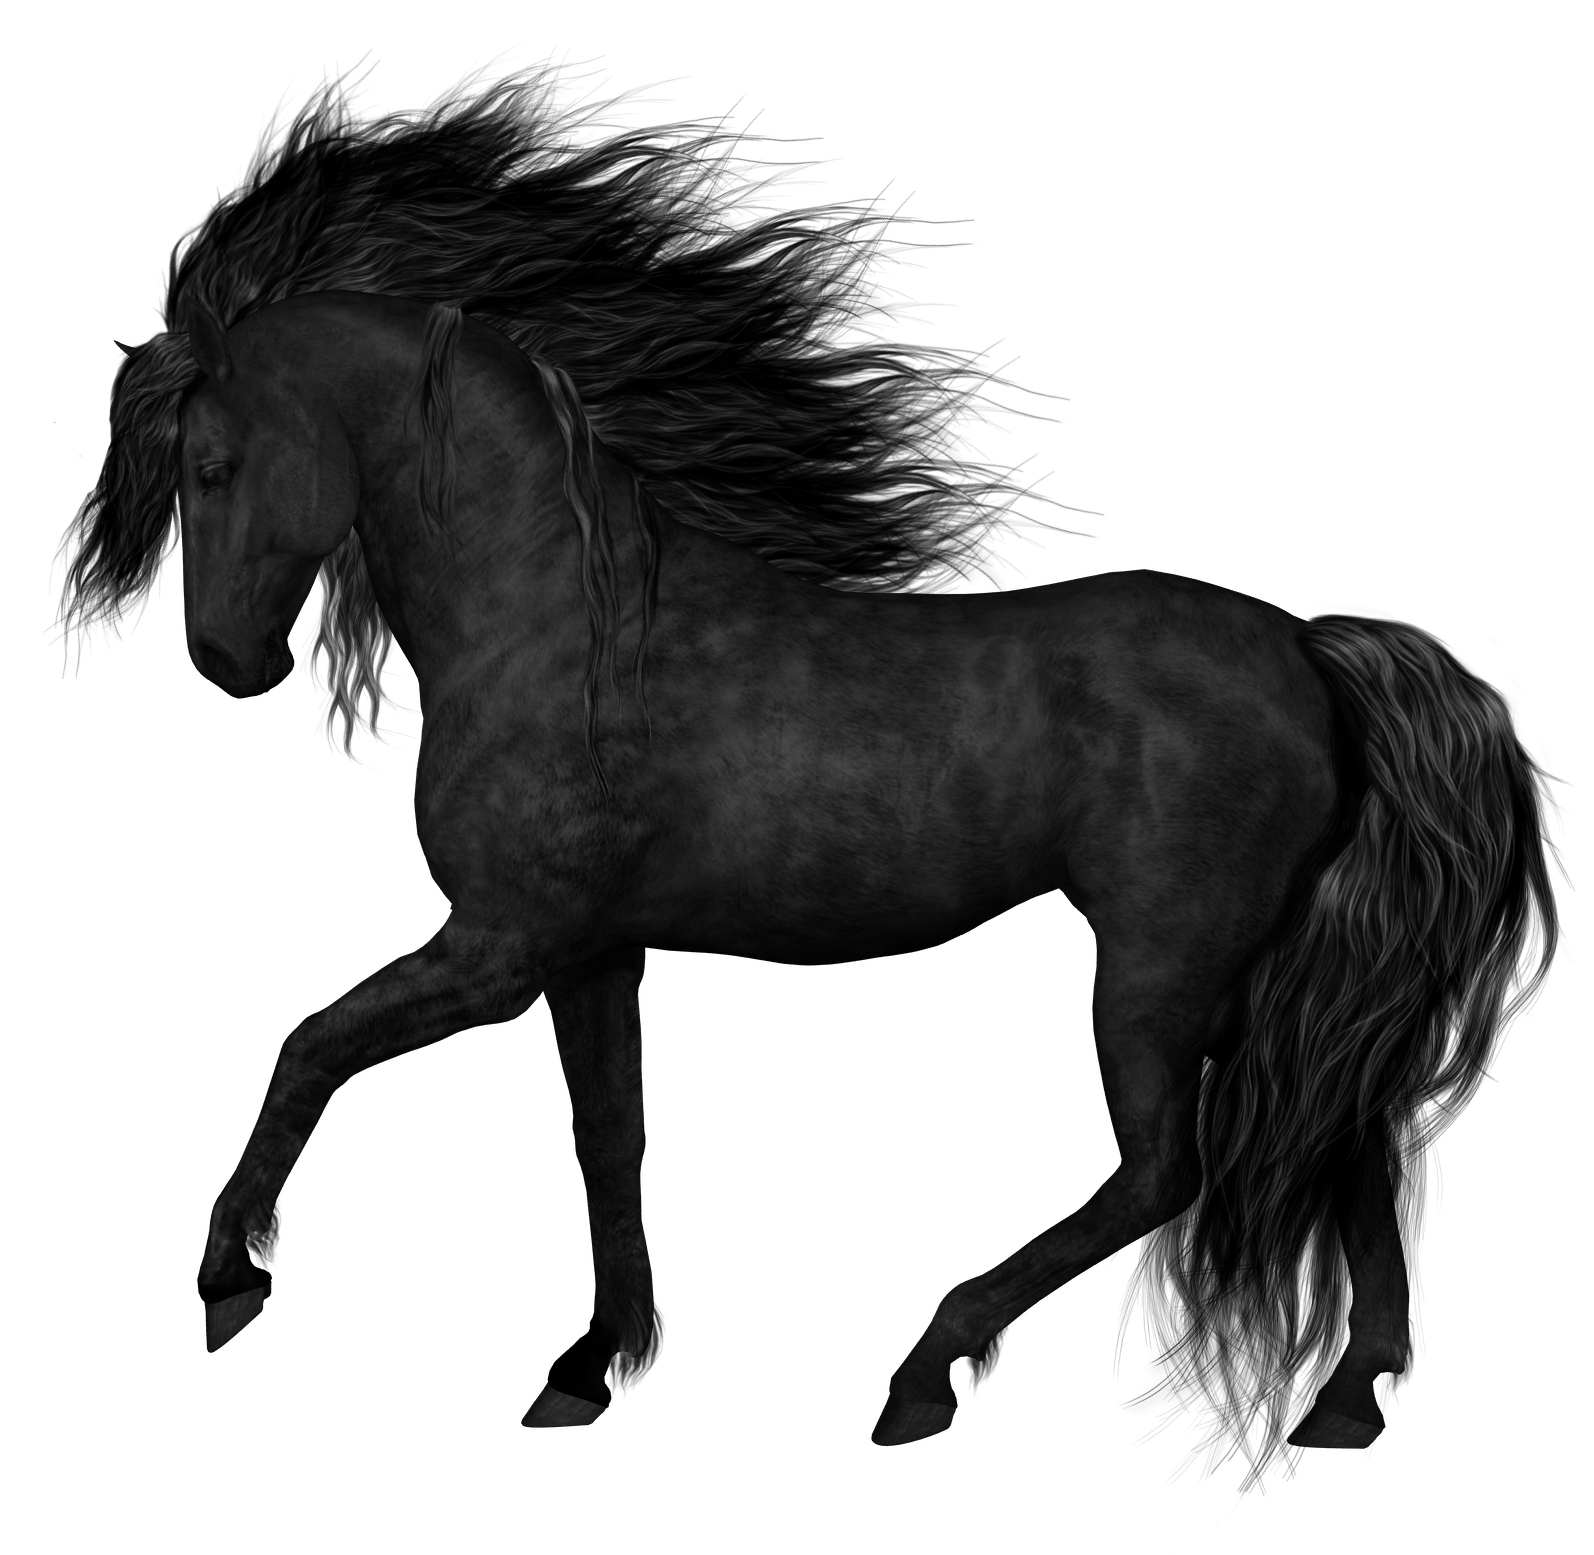 Black Horse Png Clipart Picture Horses Black Horse Horse Art